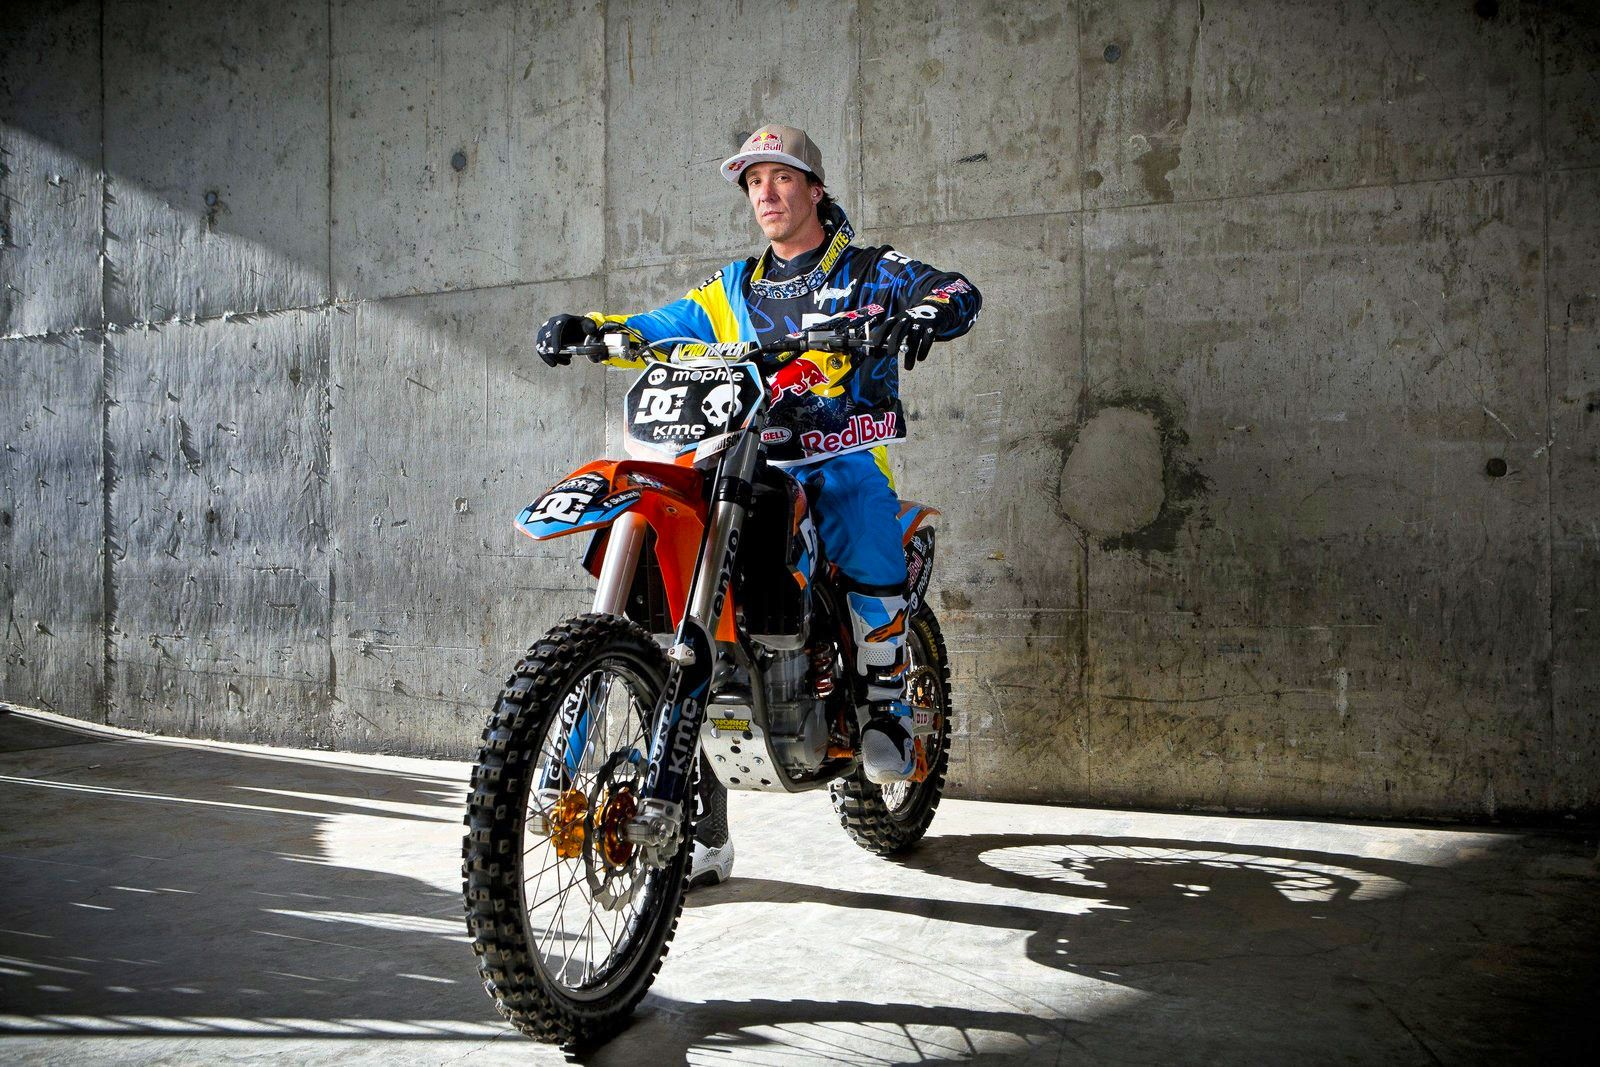 Robbie Maddison And His Incredible Dirtbike Acrobatics